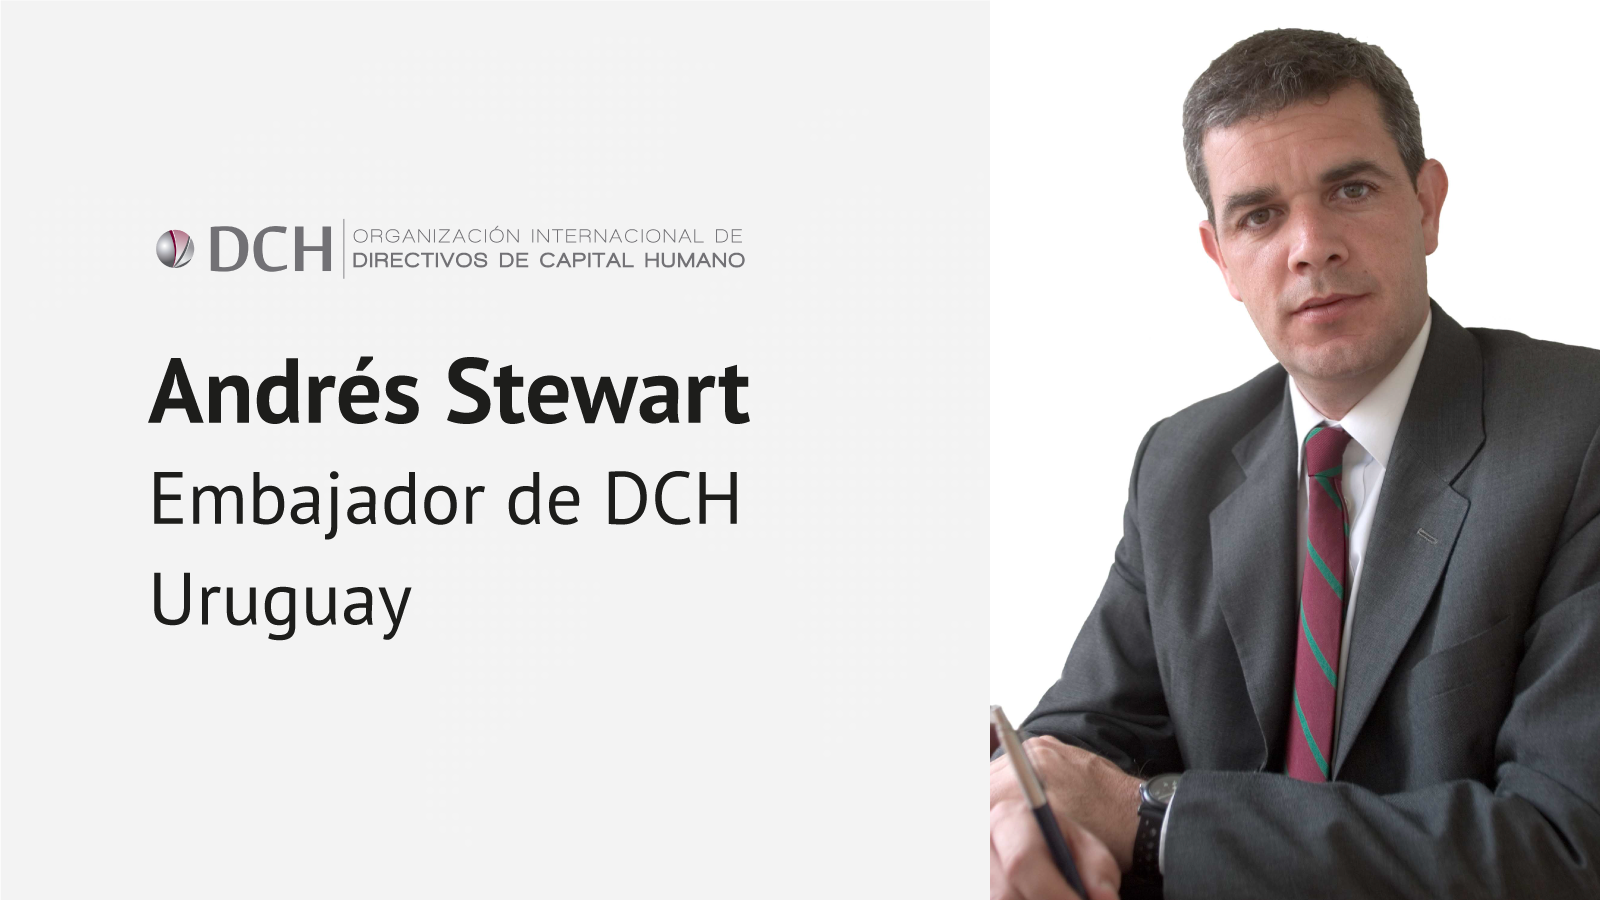 embajador-dch-uruguay